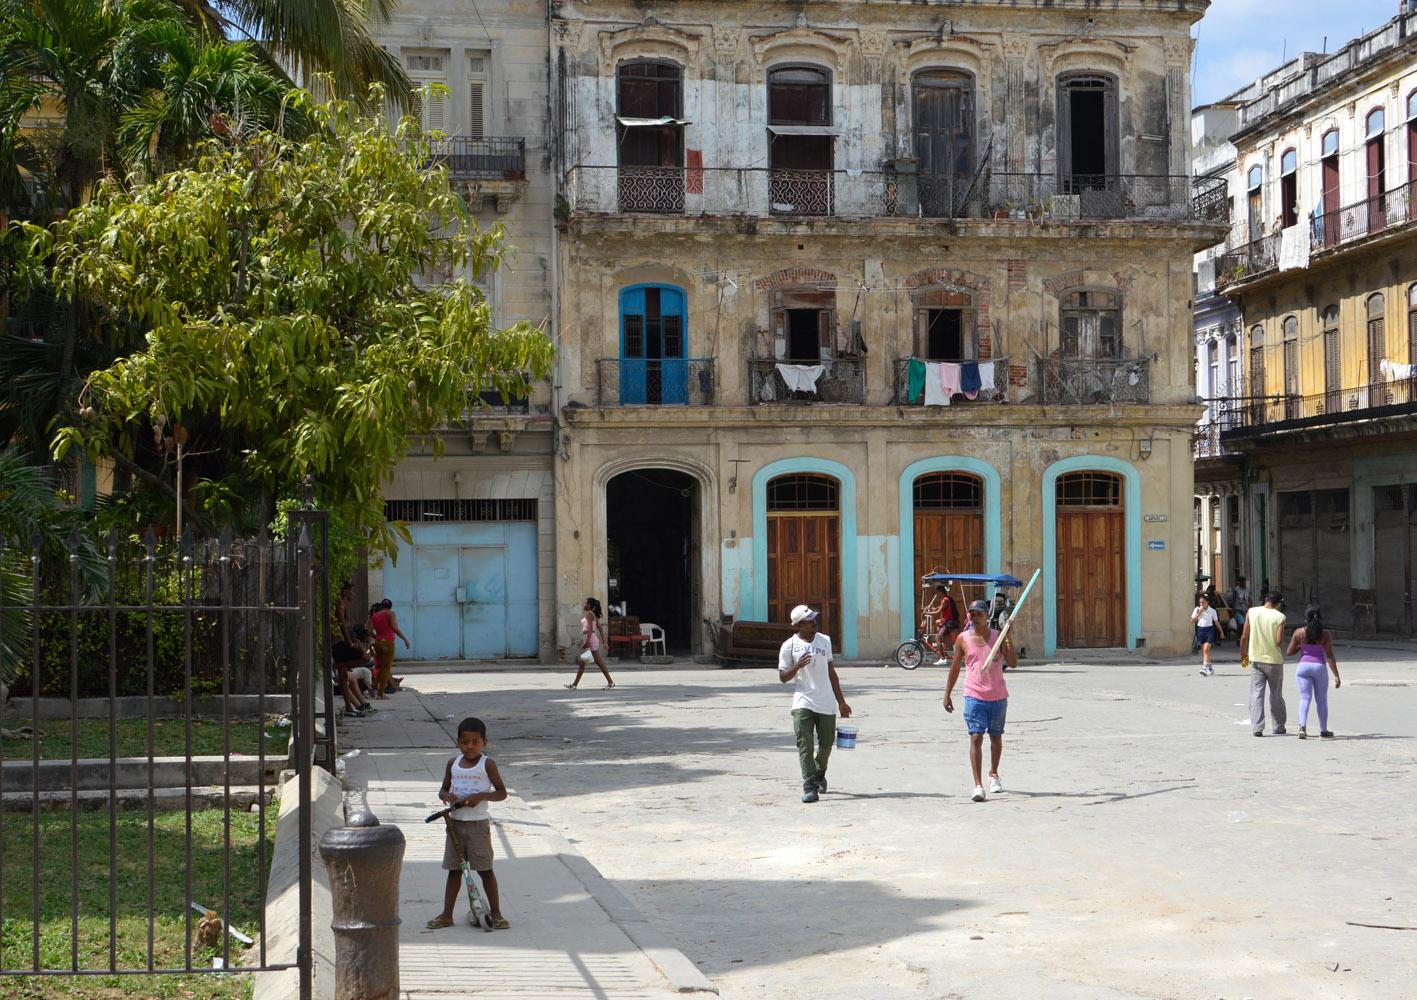 Cuba-Havana-People-Street.jpg